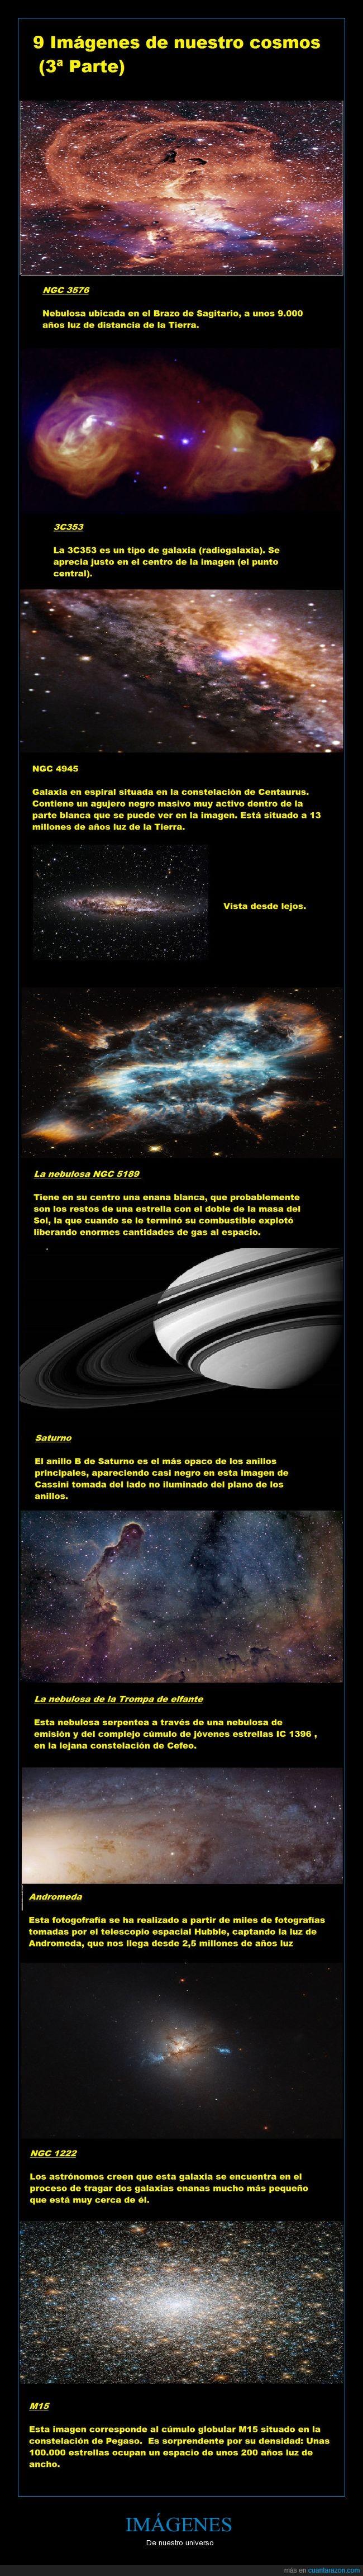 cosmos,galaxias,imagenes,nebulosas,planetas,universo